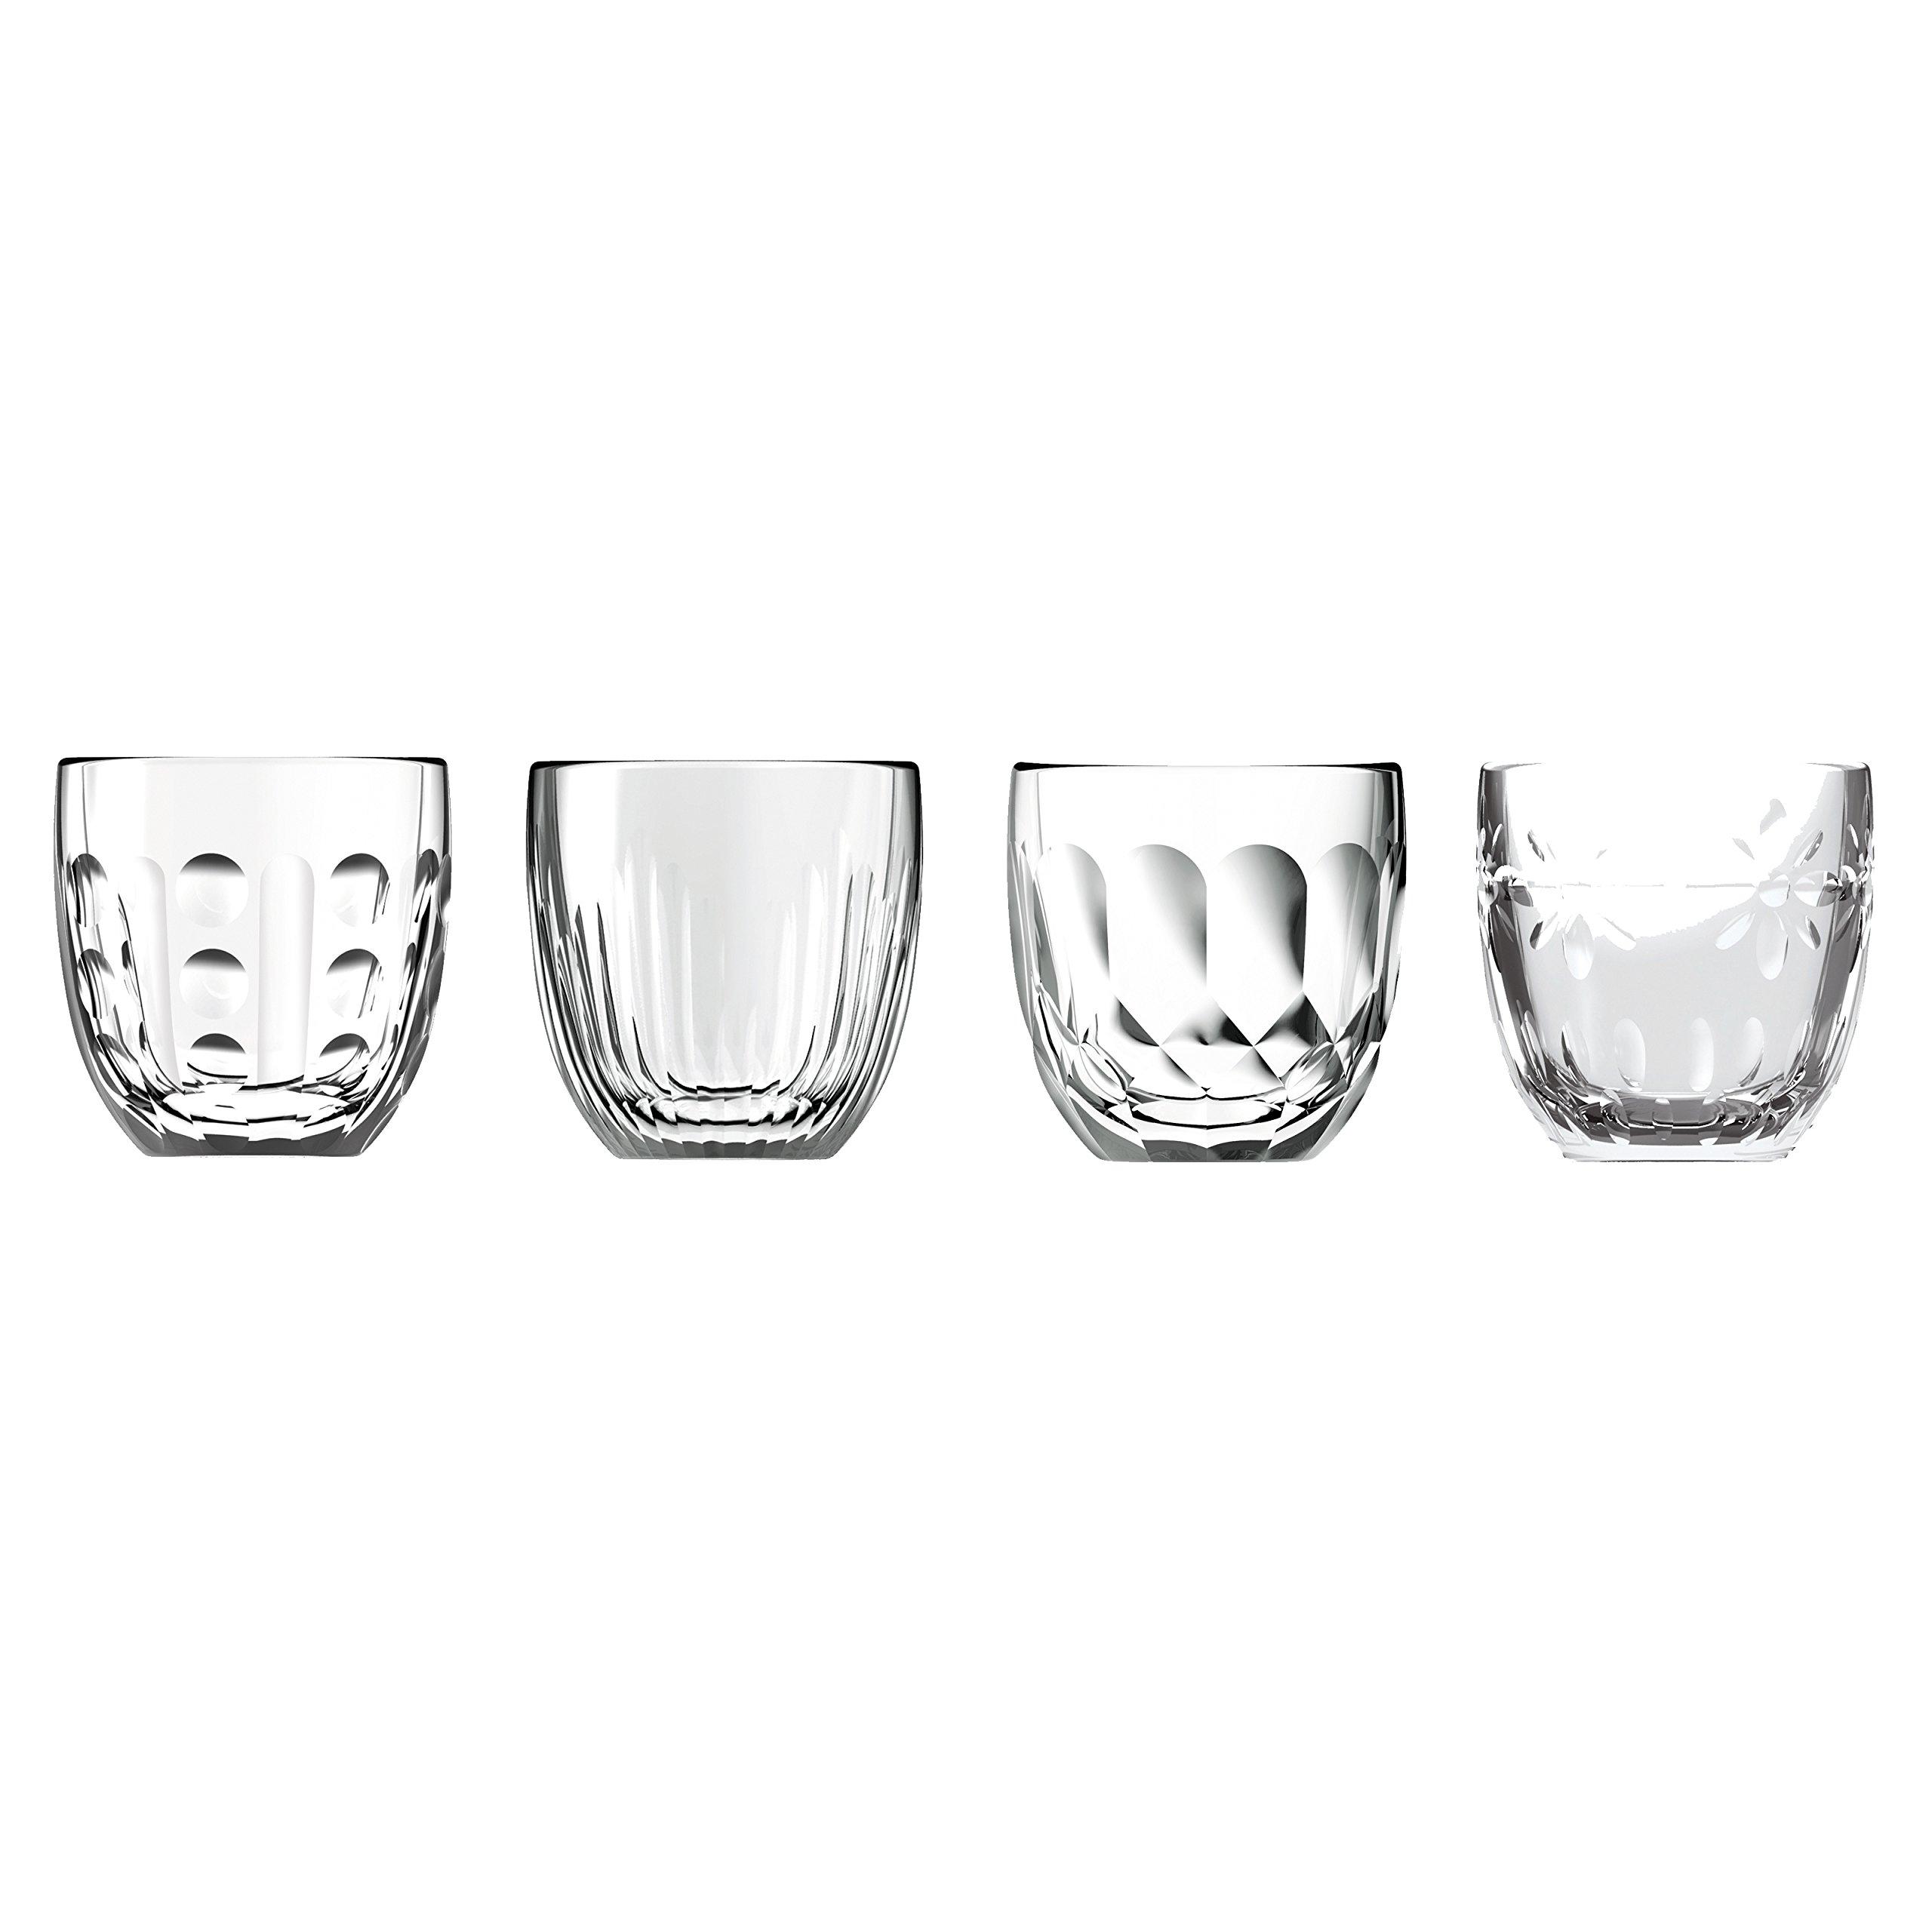 La Rochere 6380.01_481 Assorted Espresso Cups, 3.2 oz, Crystal